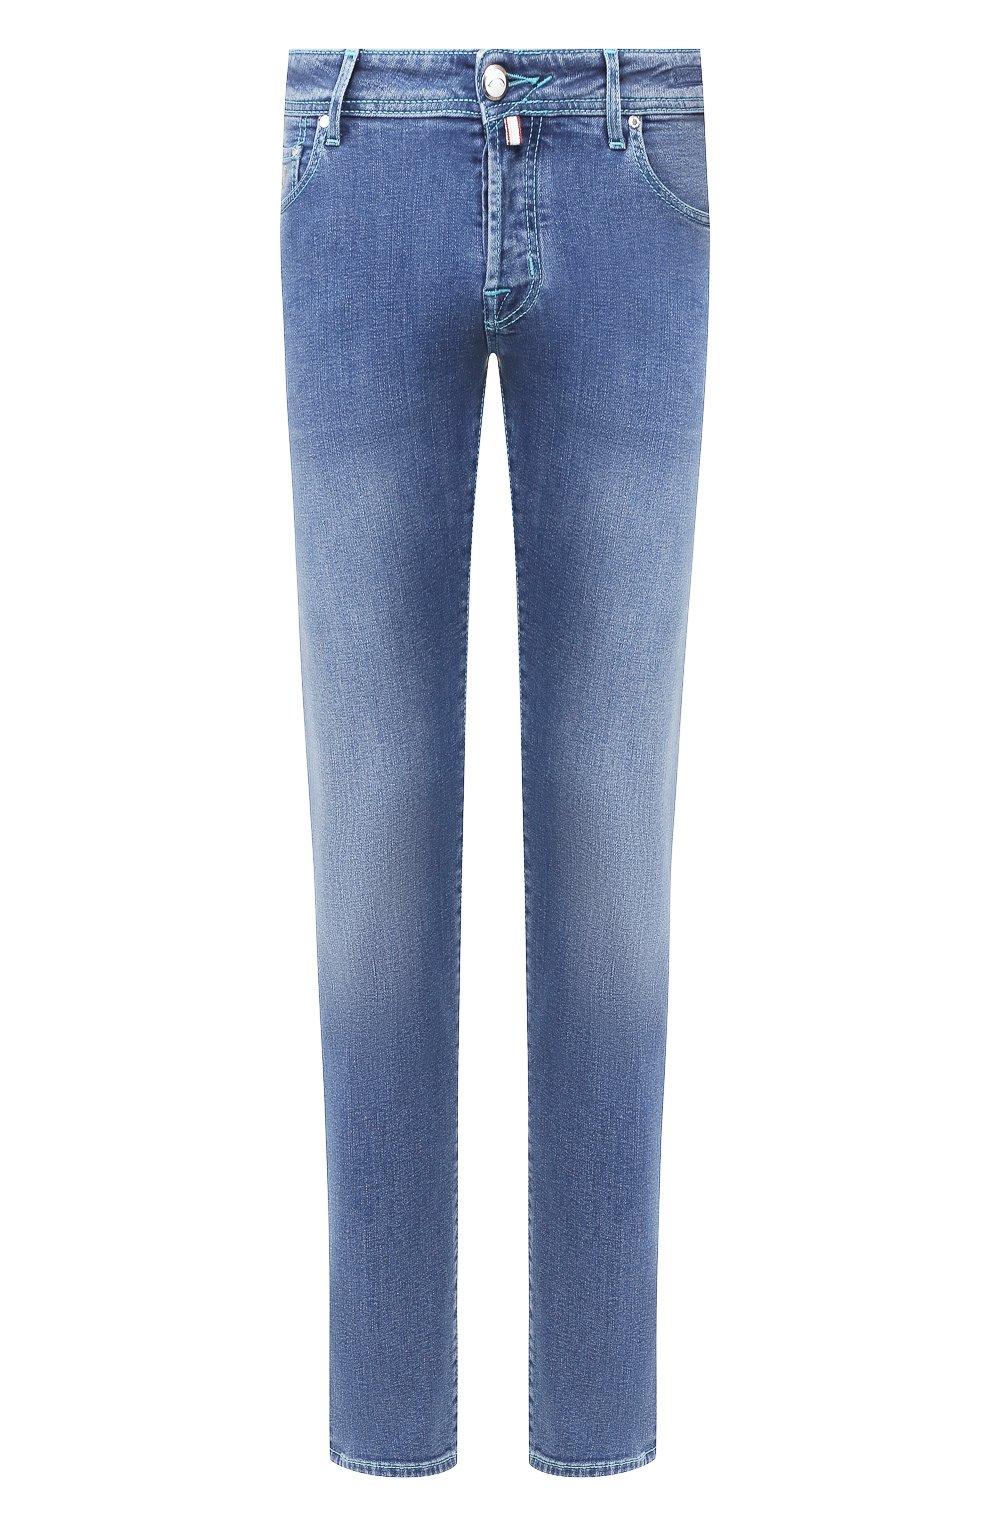 Мужские джинсы JACOB COHEN голубого цвета, арт. J622 C0MF 01850-W3/53   Фото 1